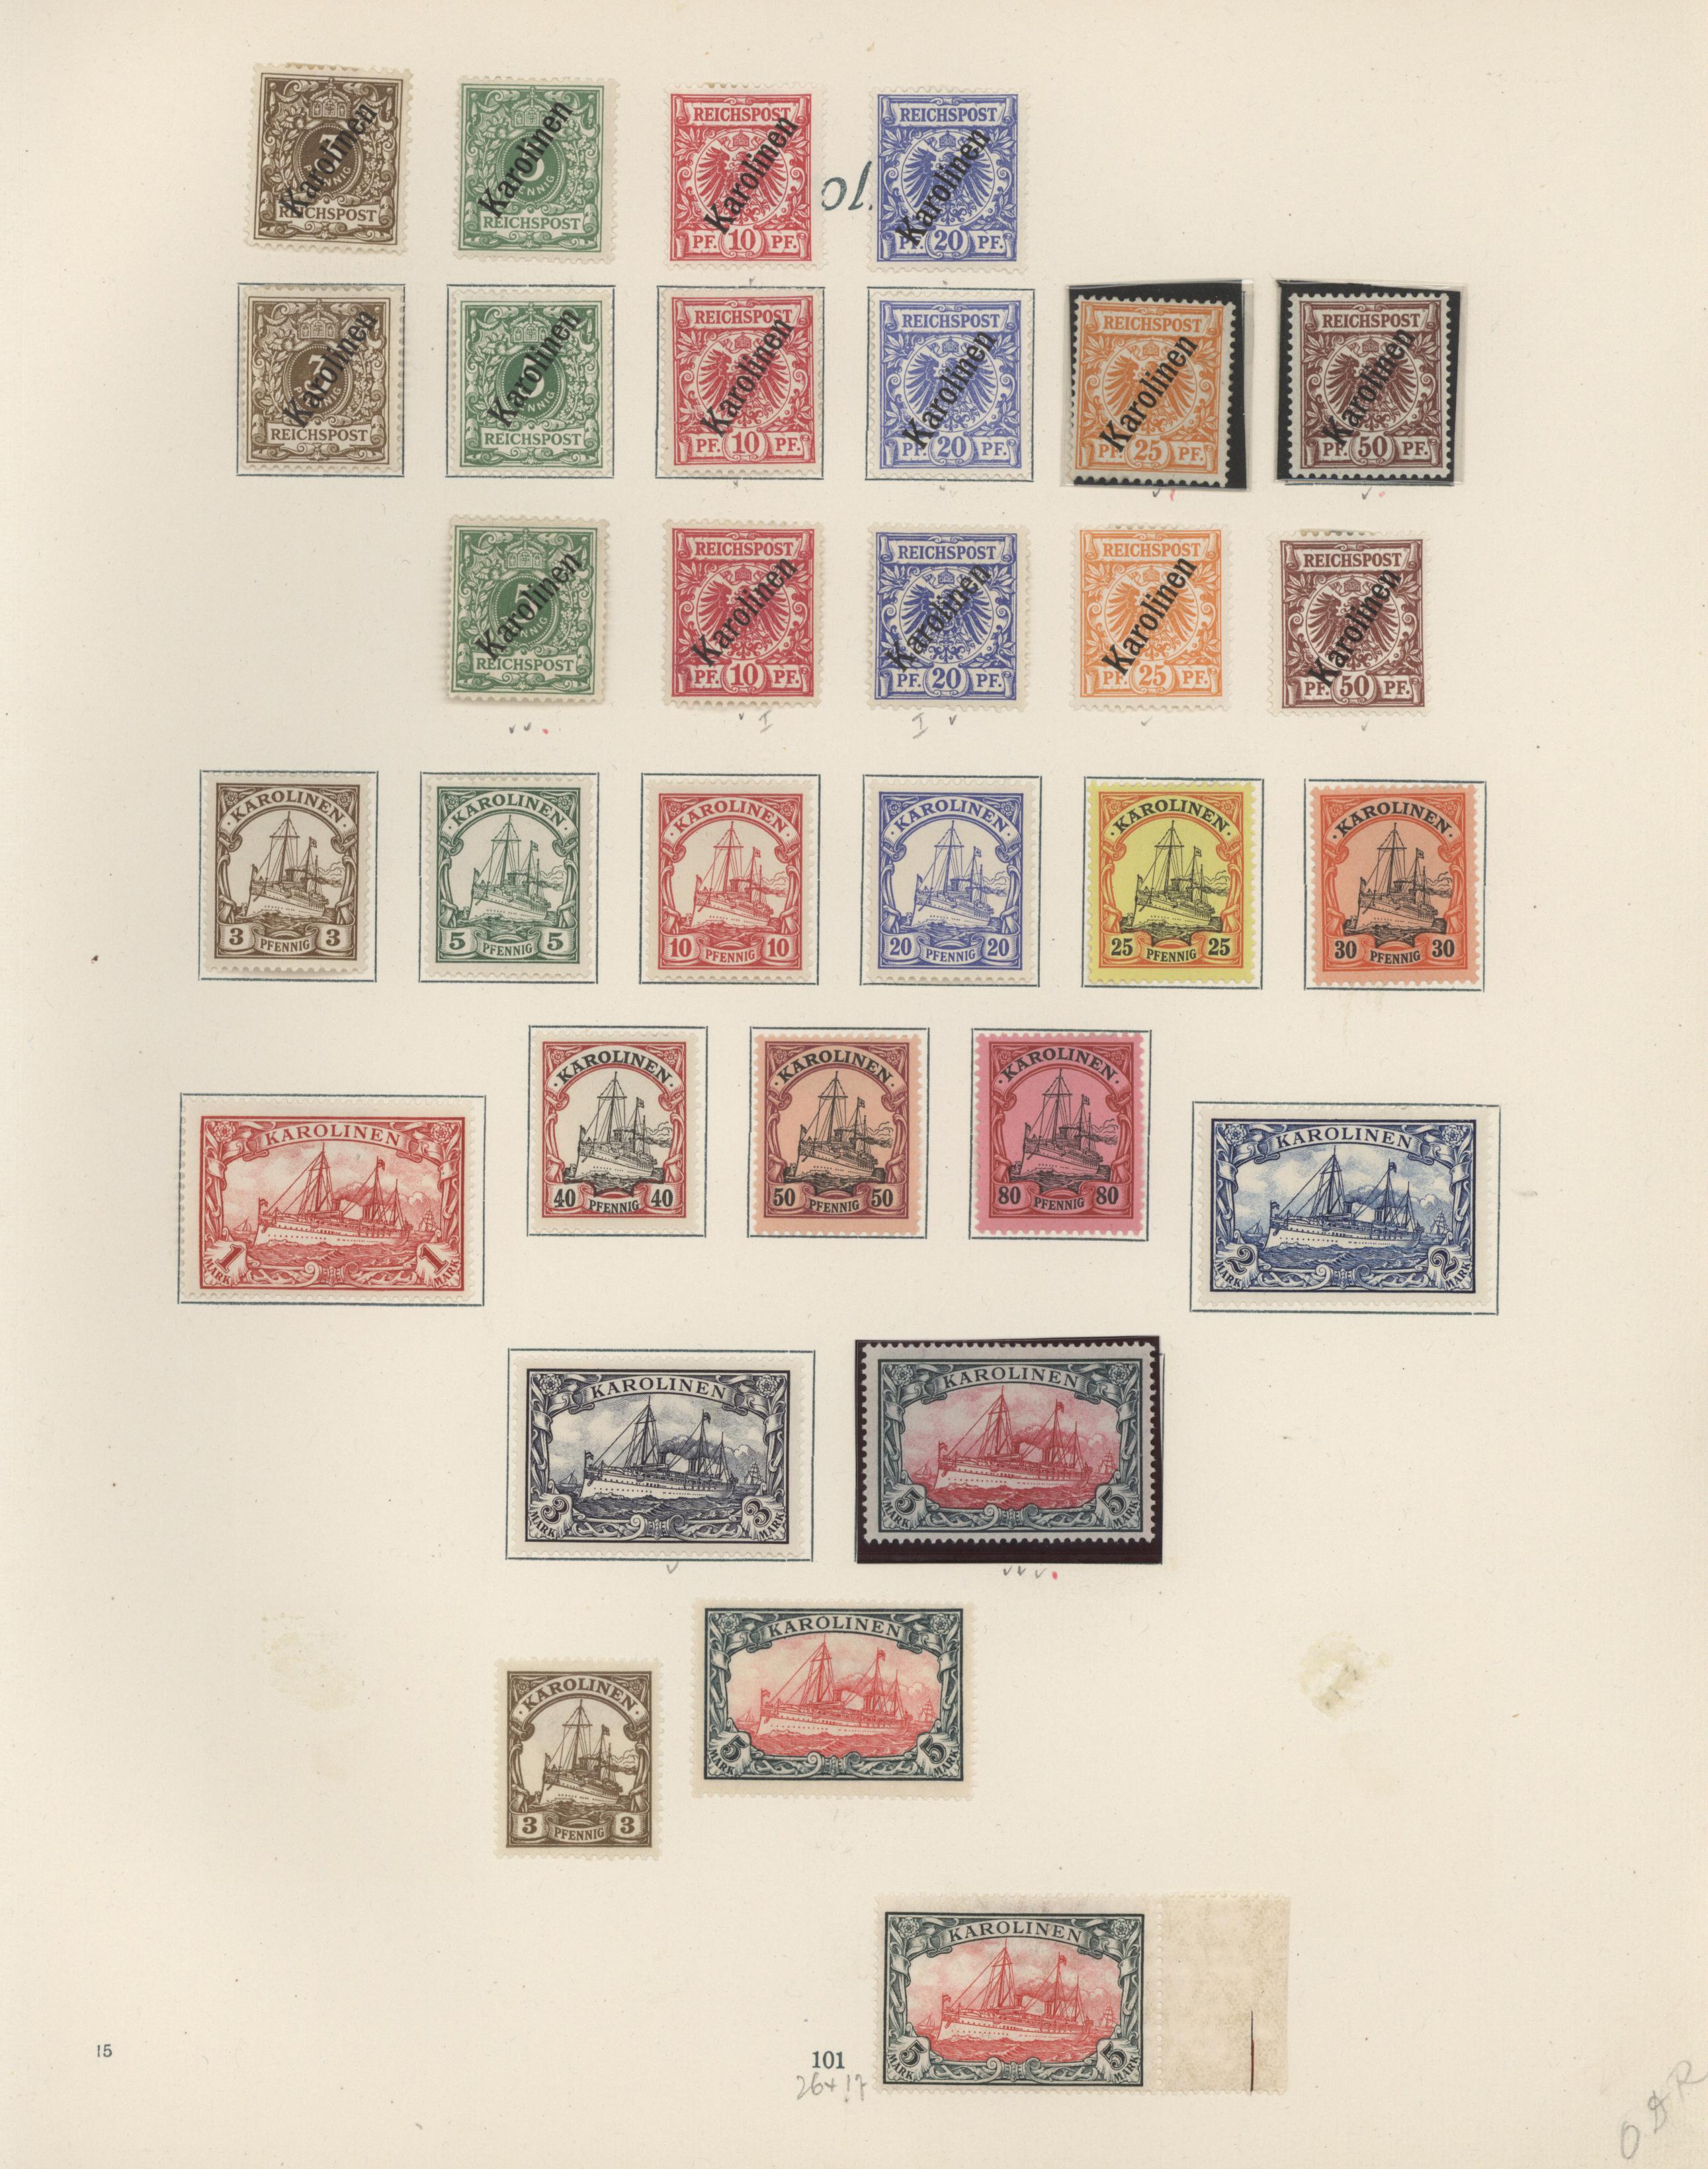 Lot 37202 - Deutsche Auslandspostämter + Kolonien  -  Auktionshaus Christoph Gärtner GmbH & Co. KG Collections Germany,  Collections Supplement, Surprise boxes #39 Day 7